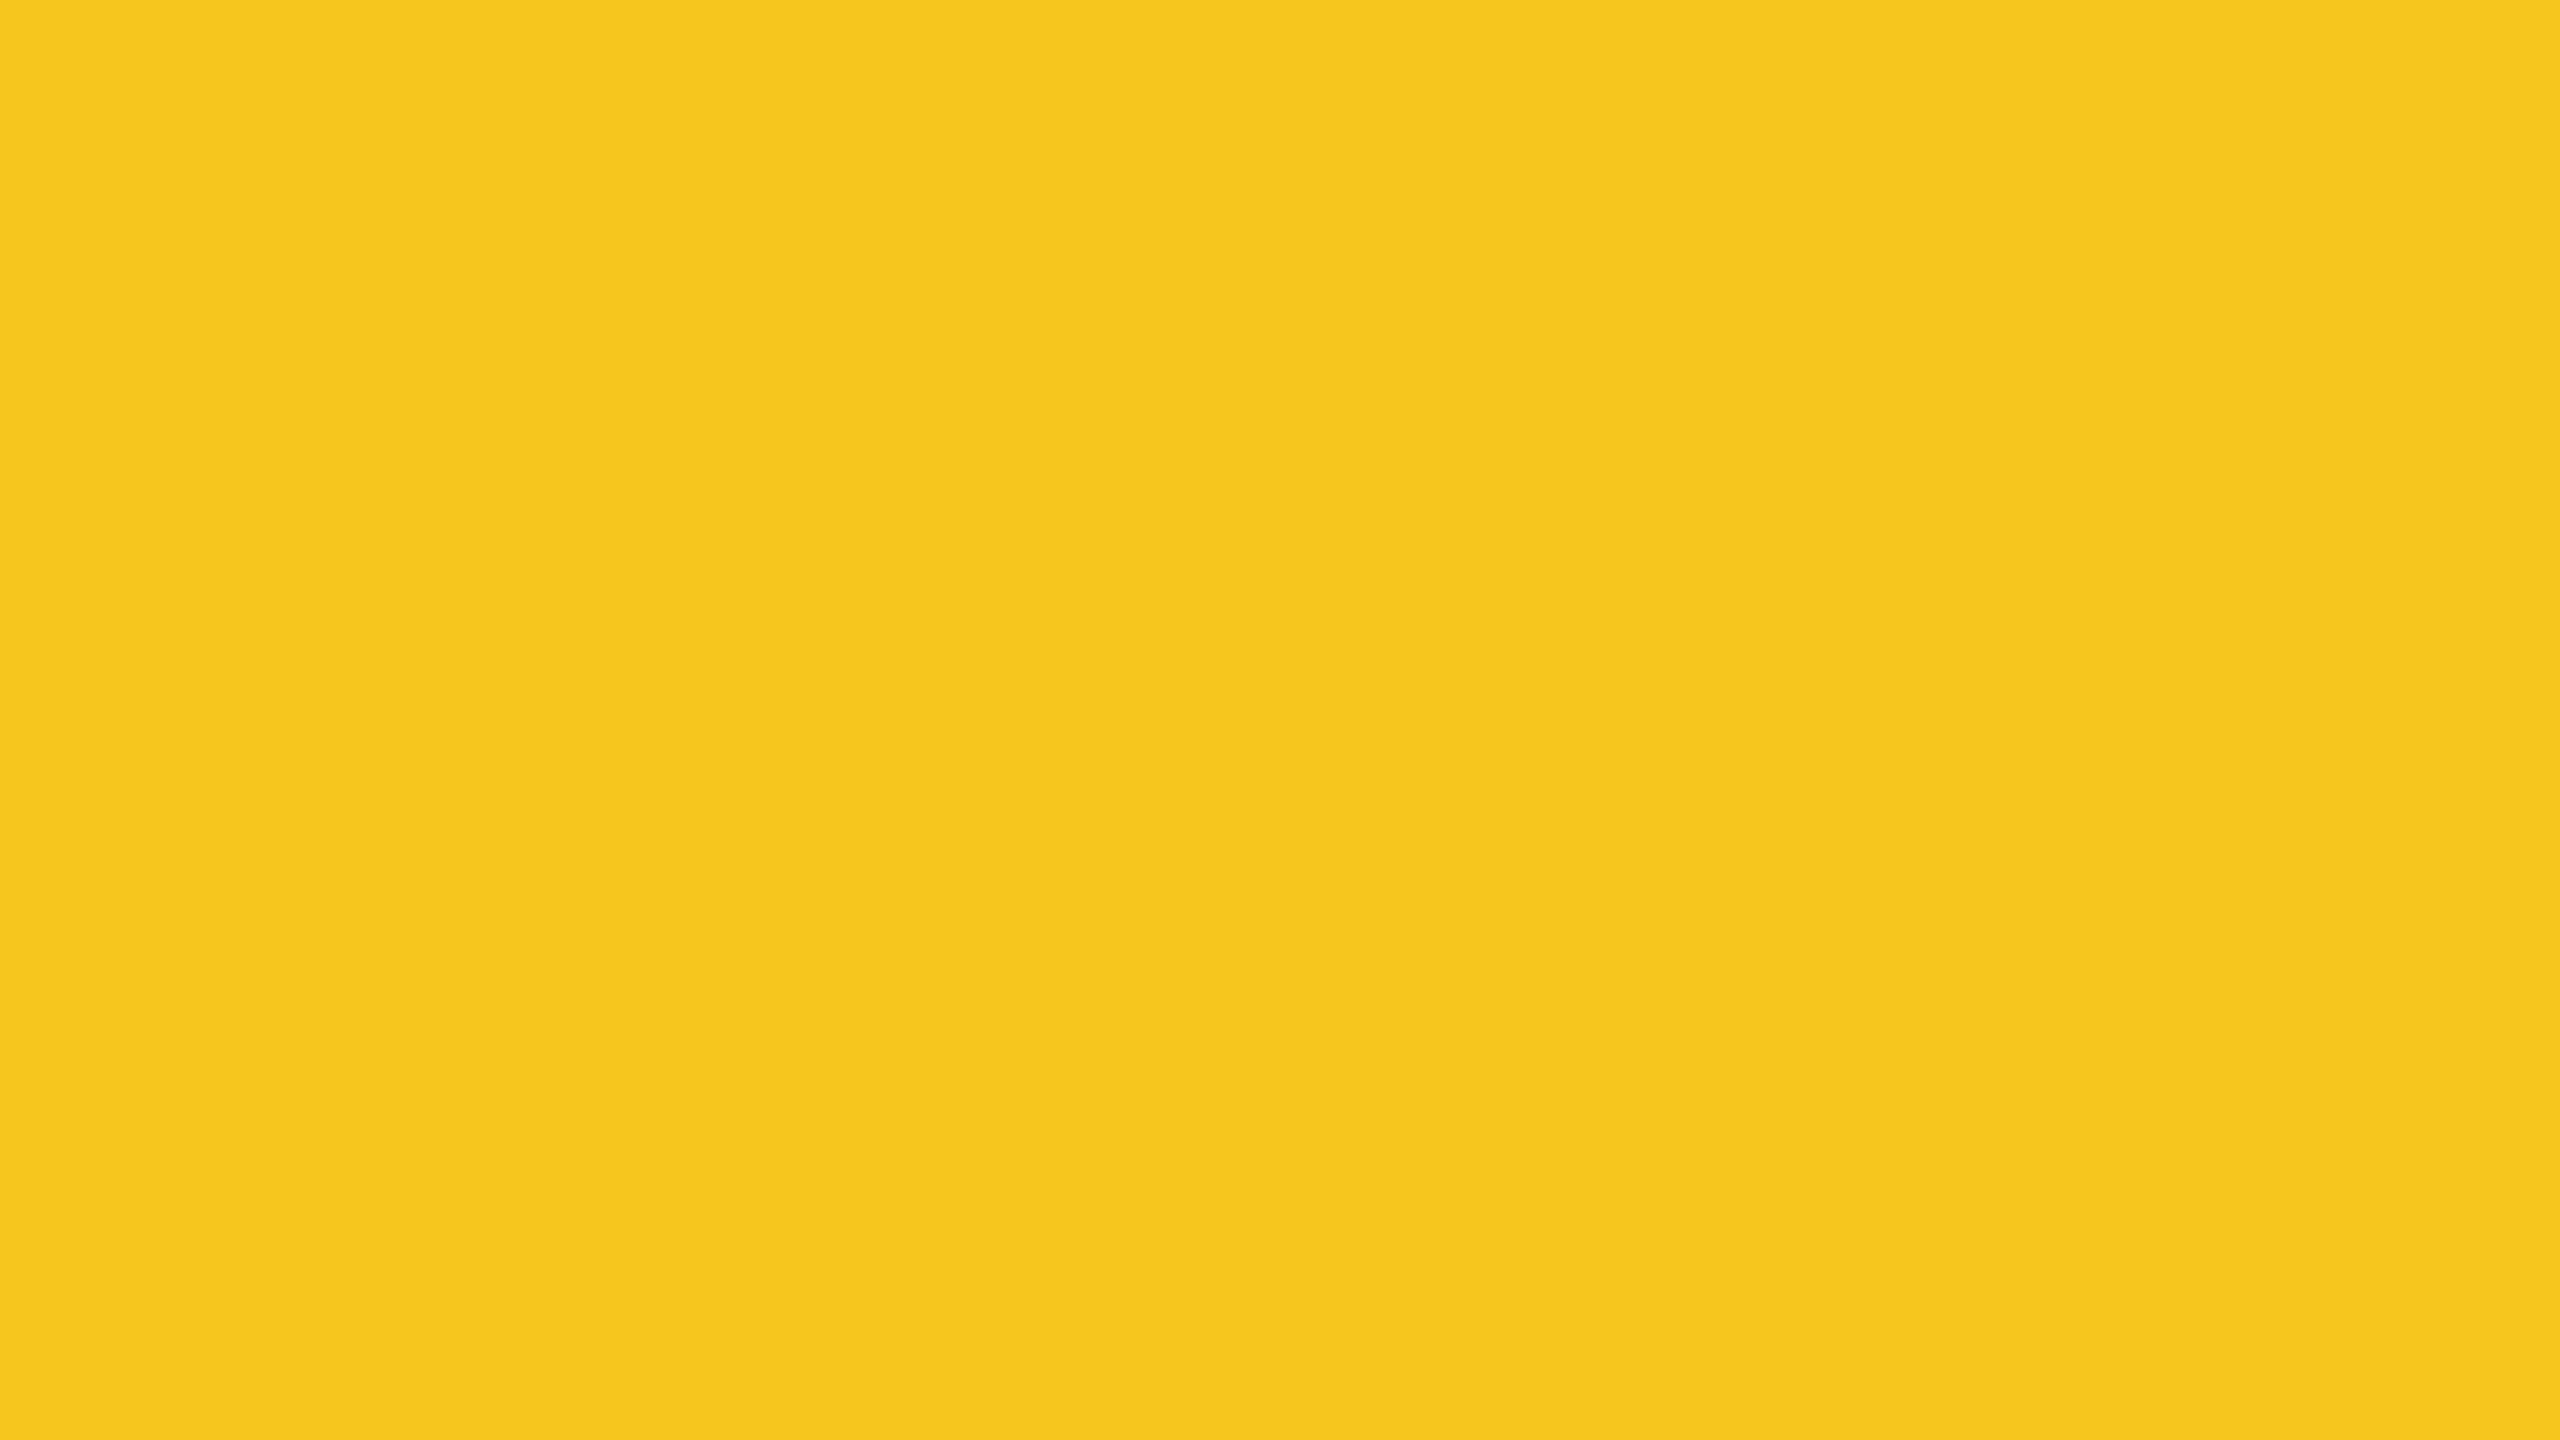 2560x1440 Deep Lemon Solid Color Background